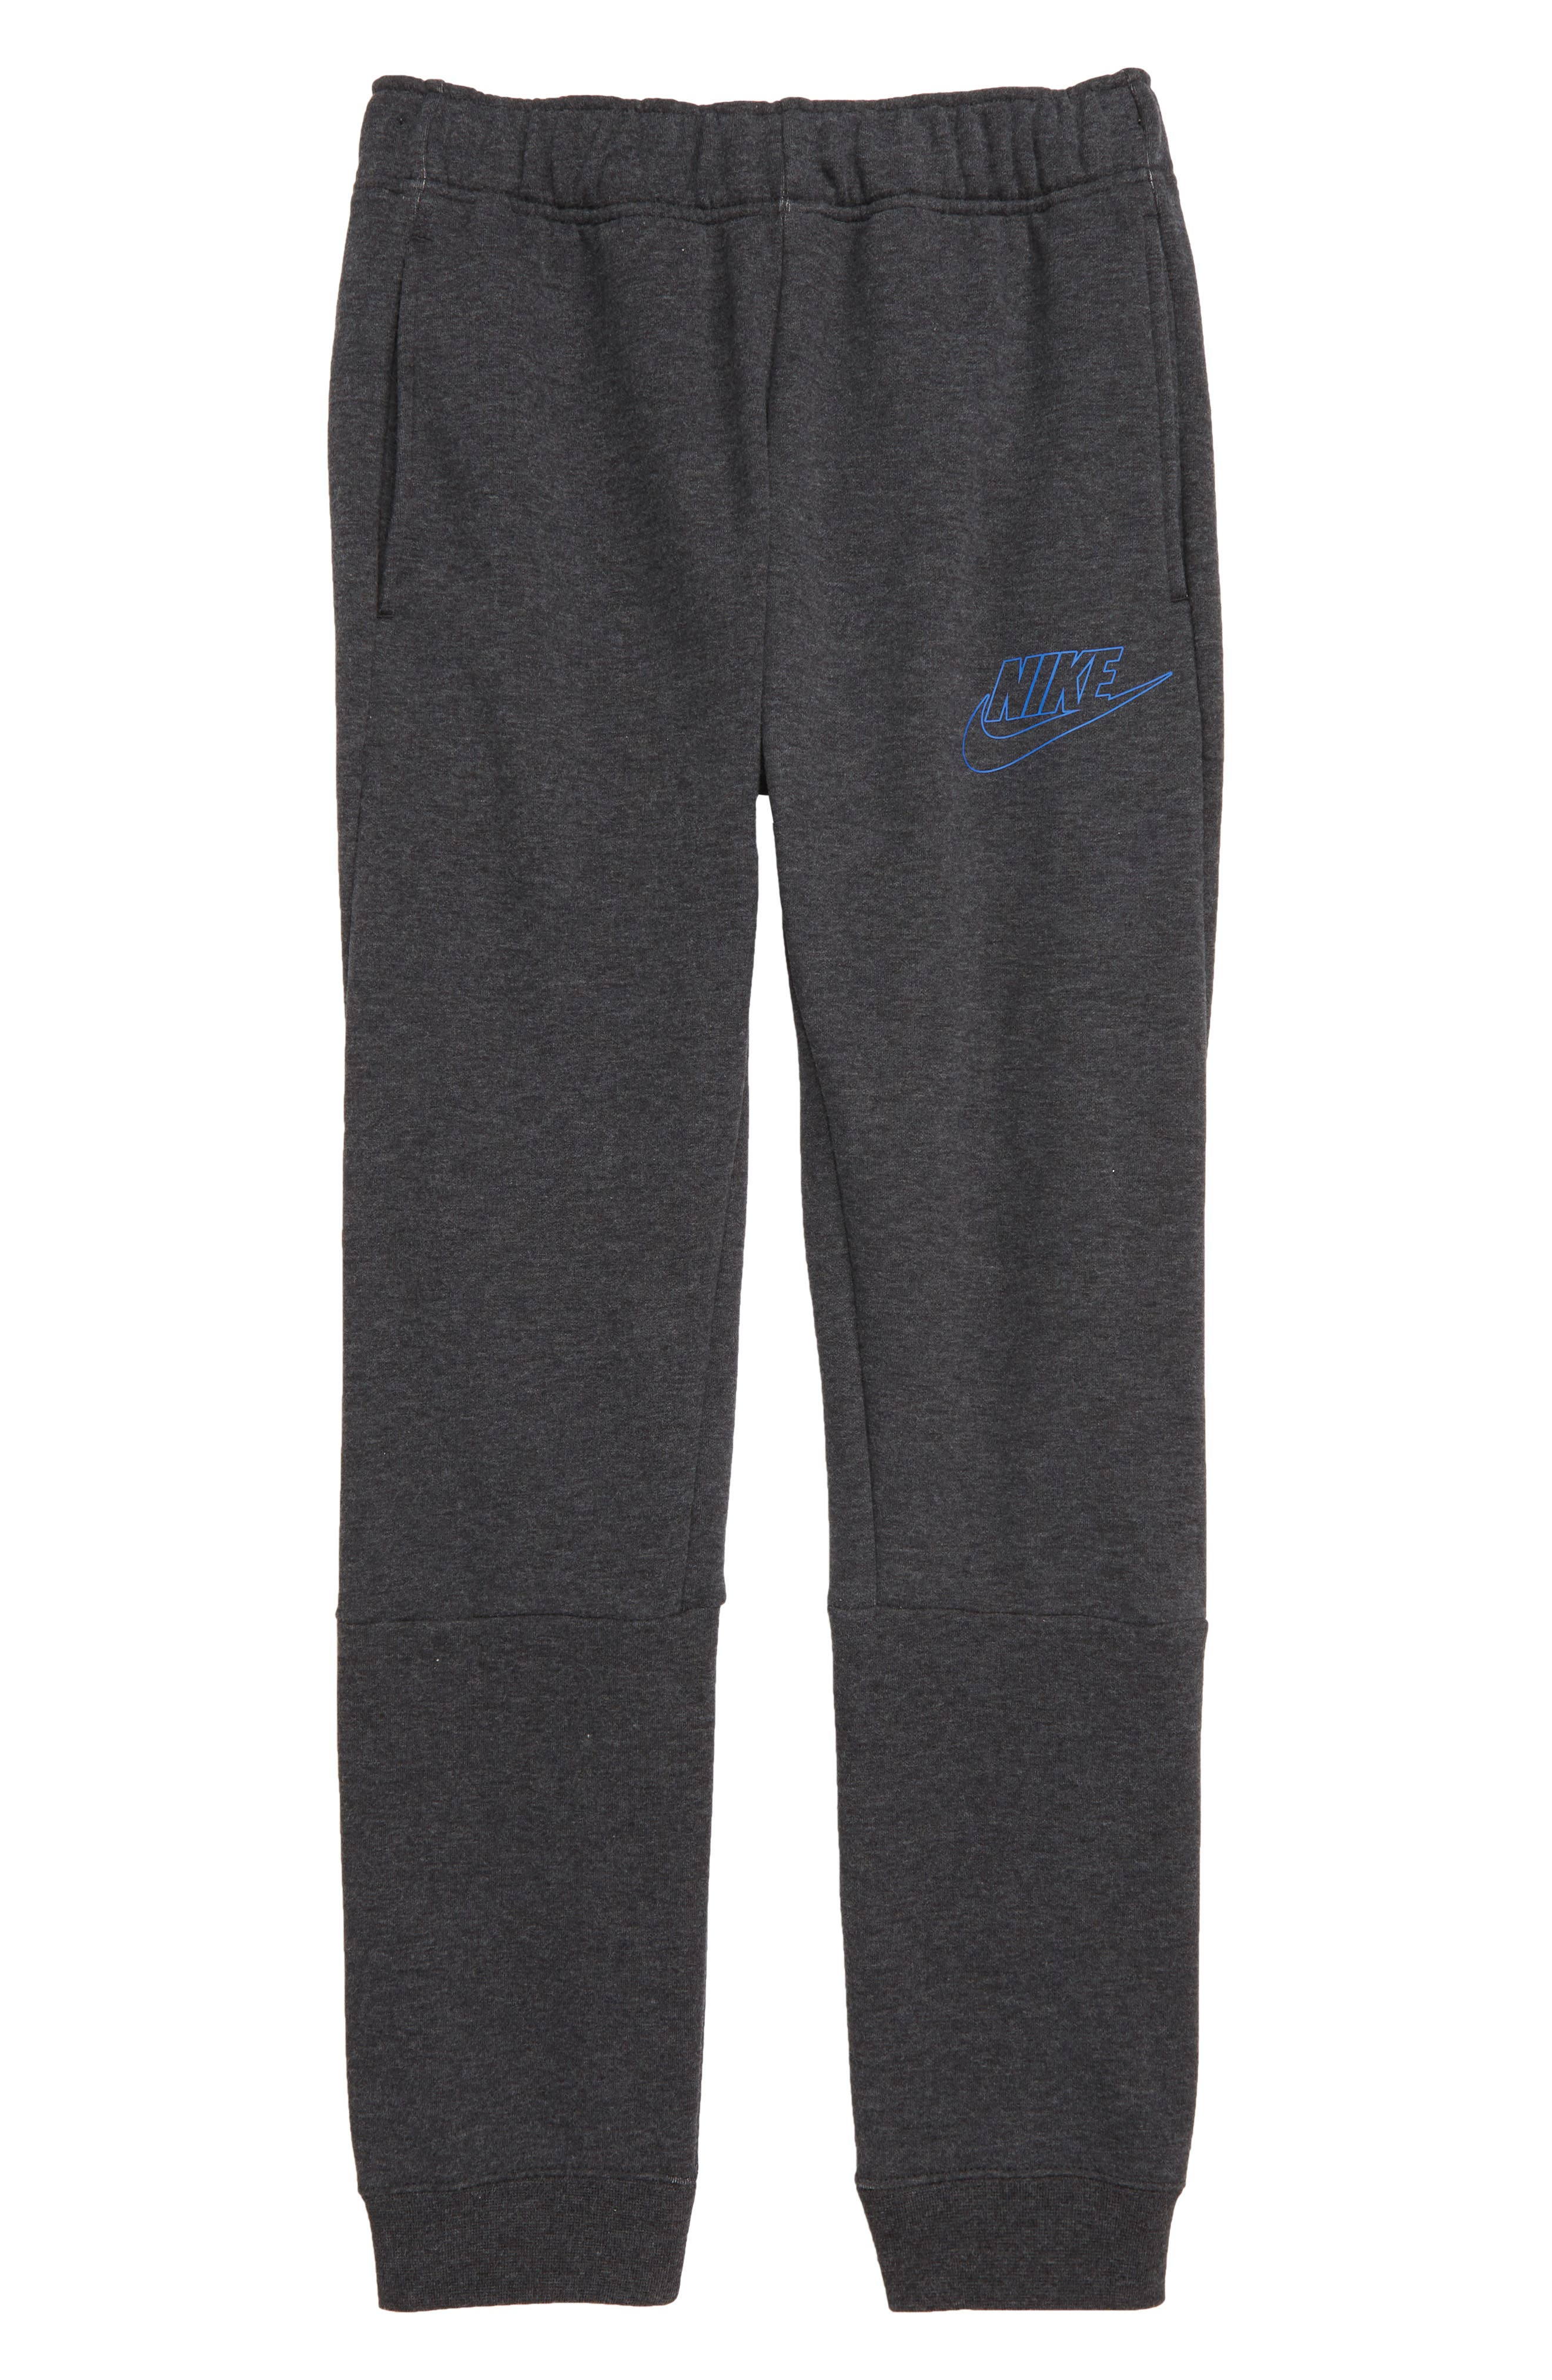 Sportswear My Nike Sweatpants,                             Main thumbnail 1, color,                             BLACK HEATHER/ GAME ROYAL